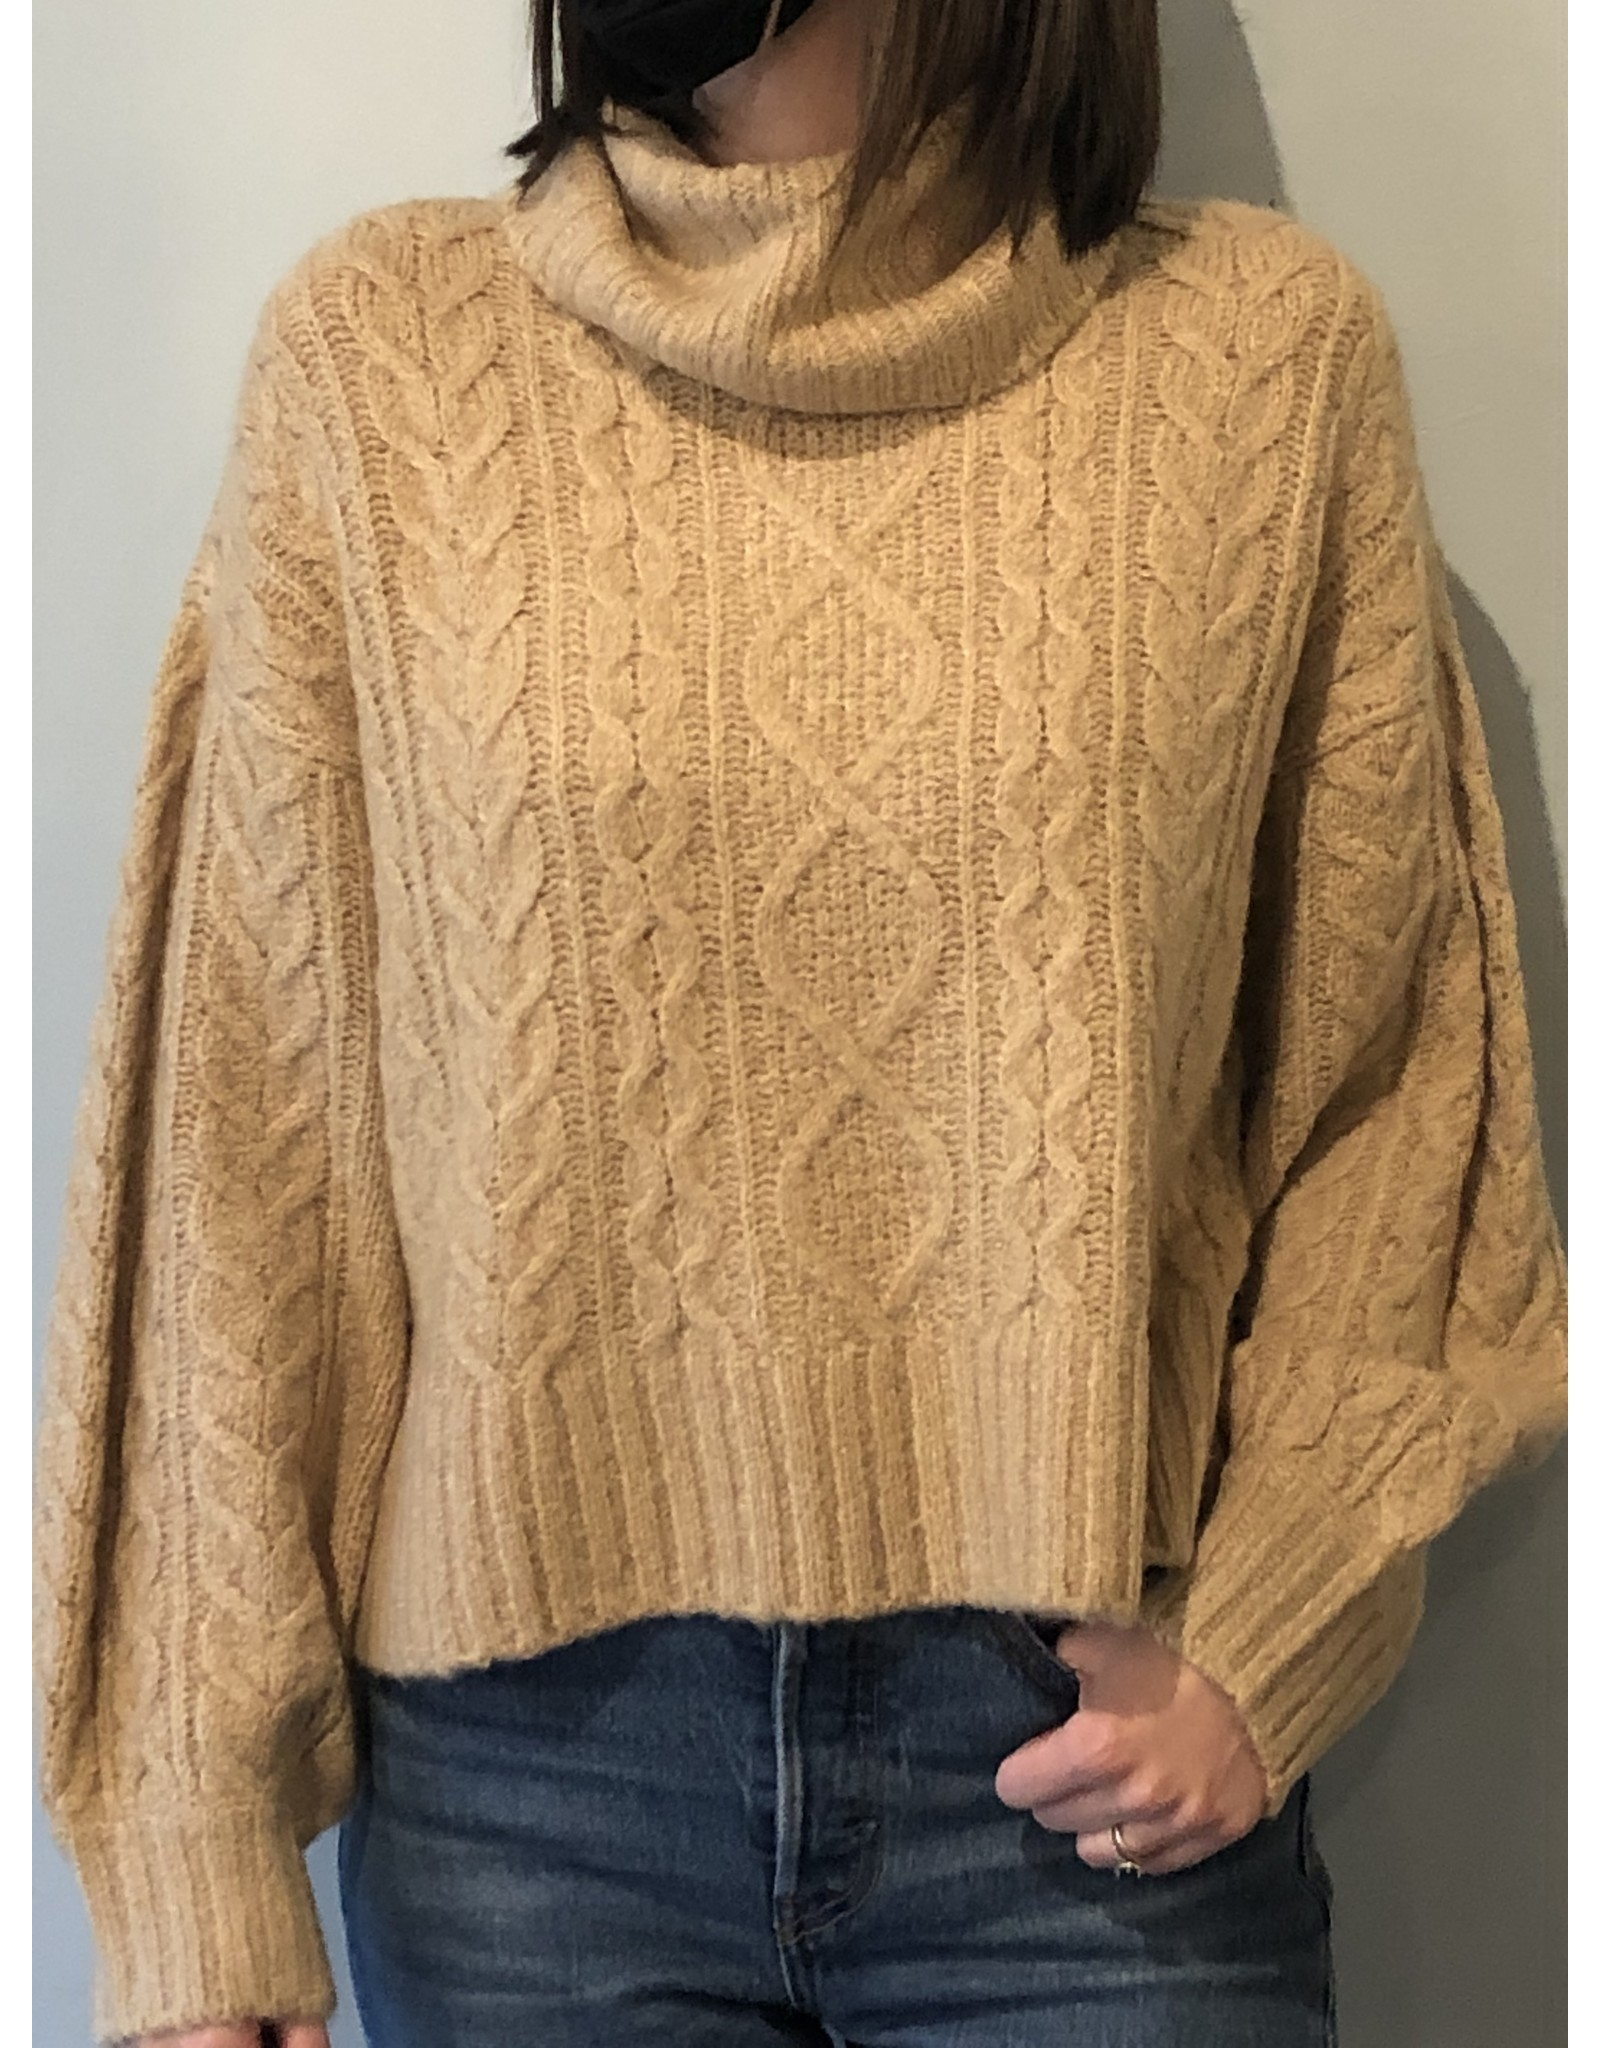 Bonanza - Cropped Cable Knit Sweater